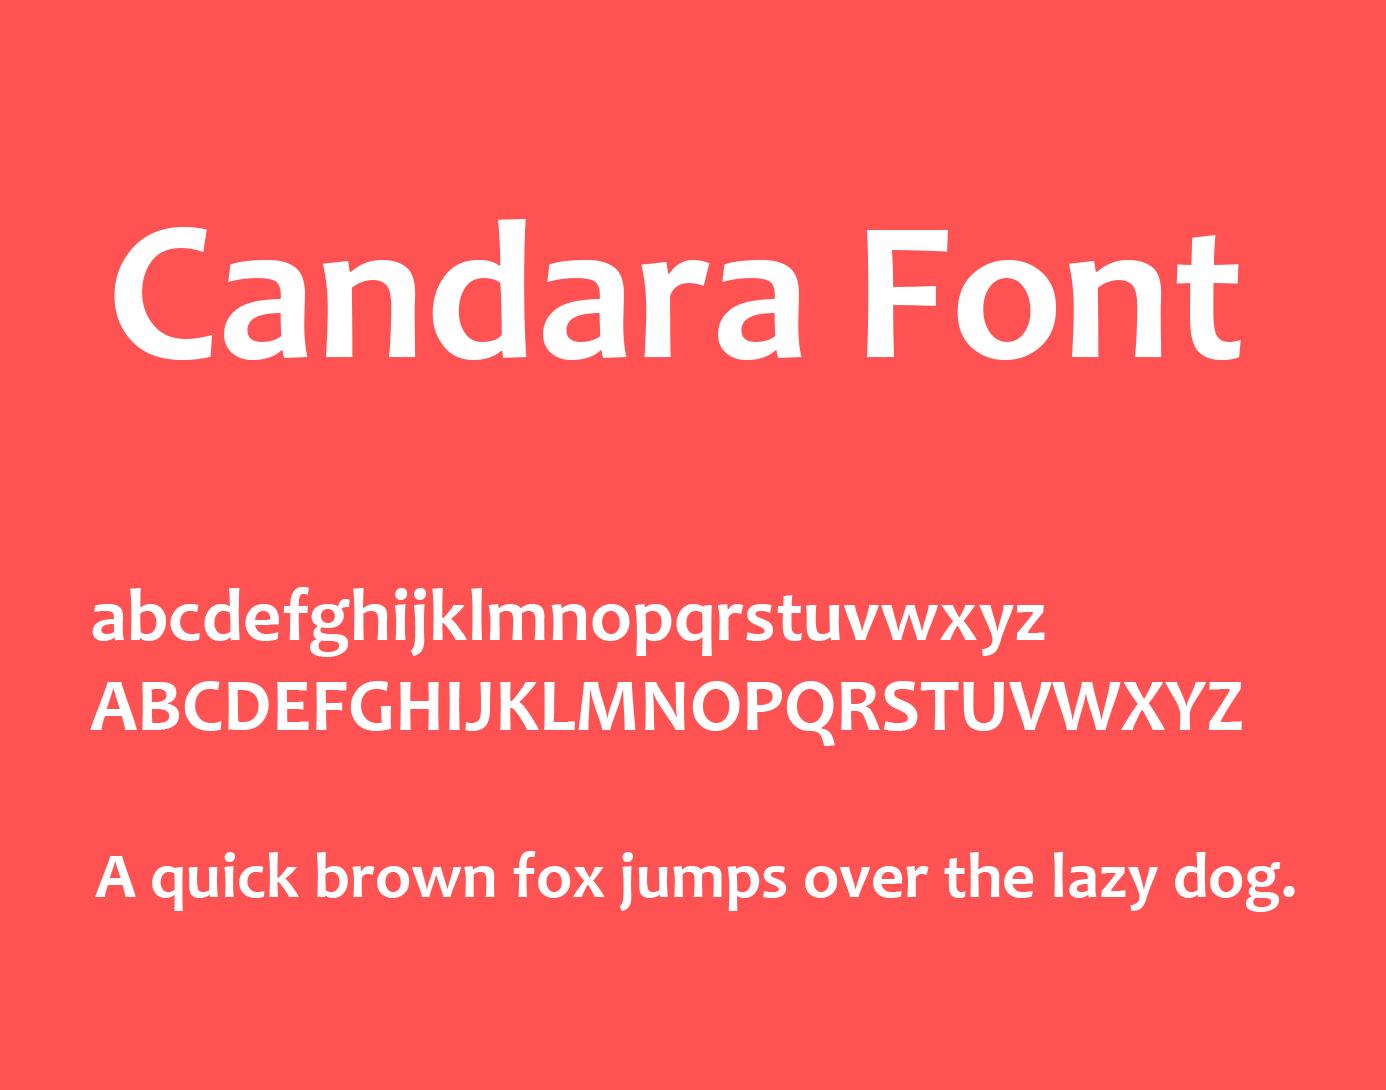 Candara Font Free Download | Fonts | Free fonts download